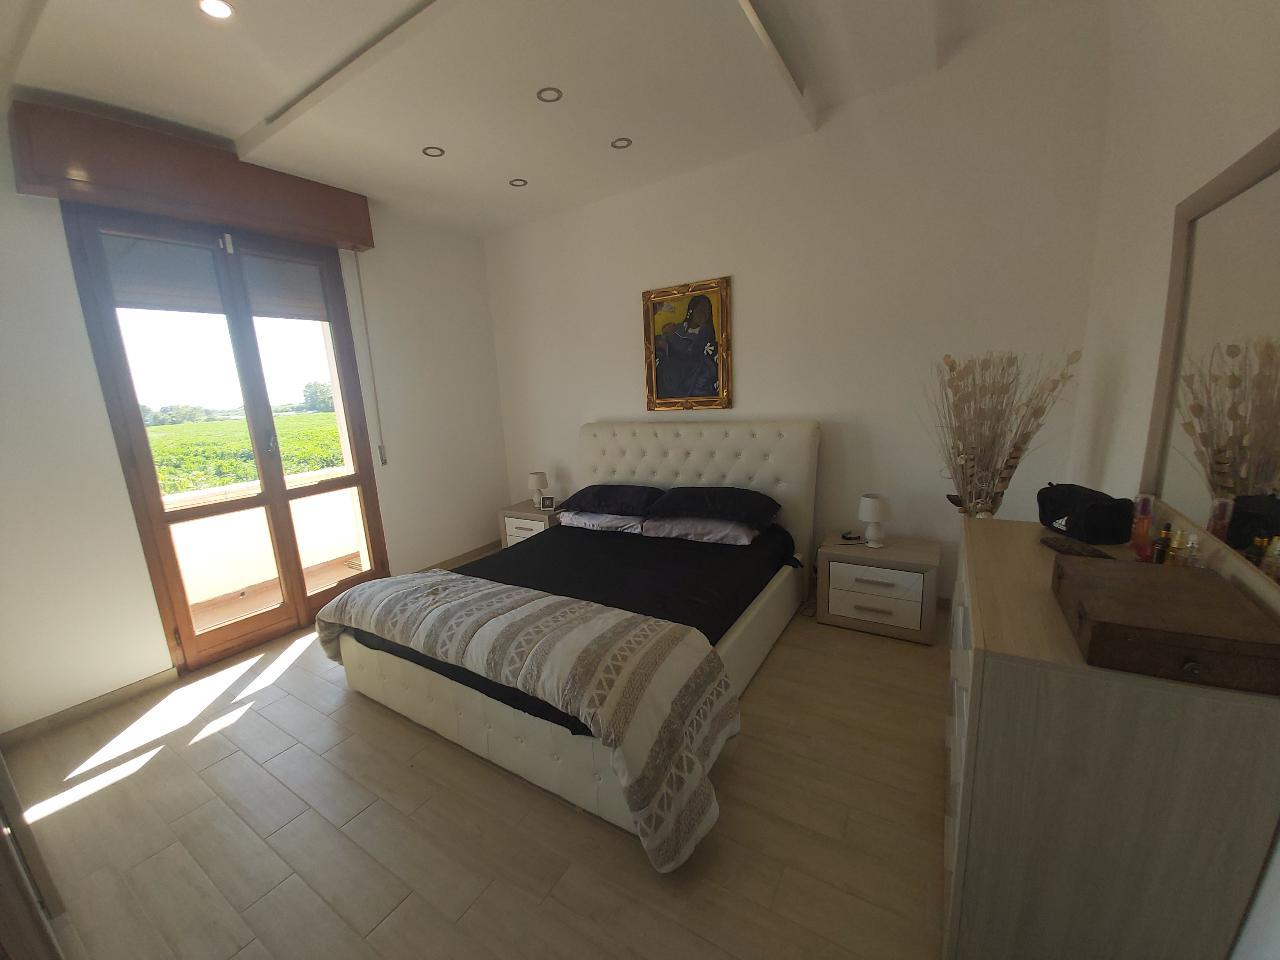 Appartamento CASTELVETRO PIACENTINO €105.000,00